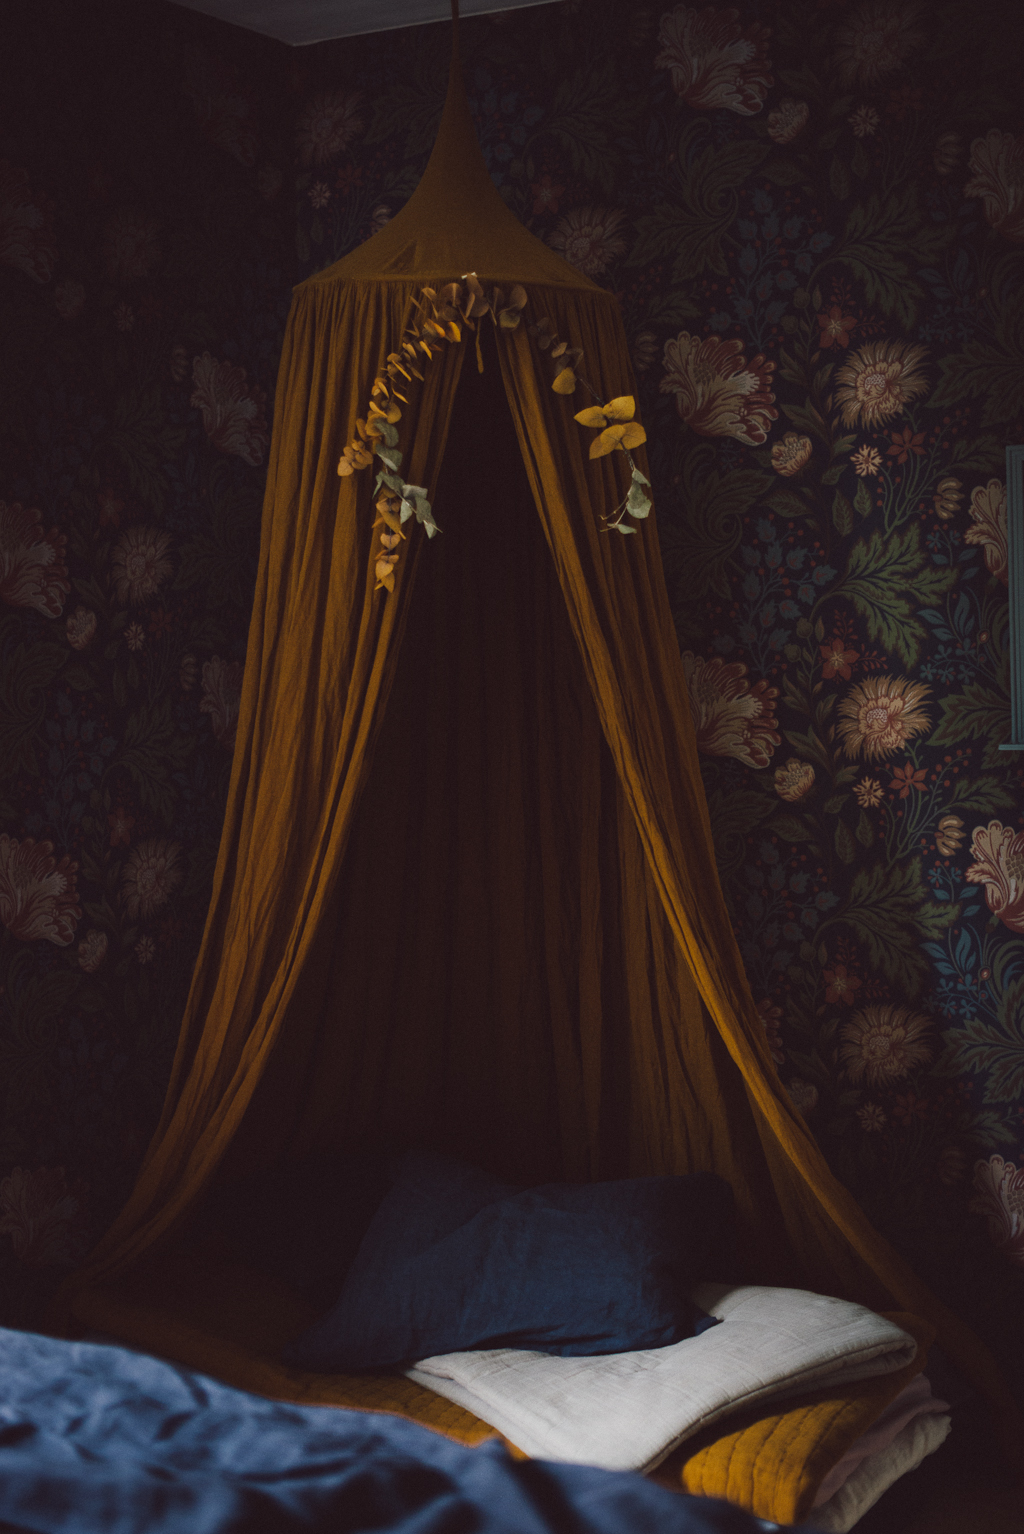 Ava Sandberg by Babes in Boyland